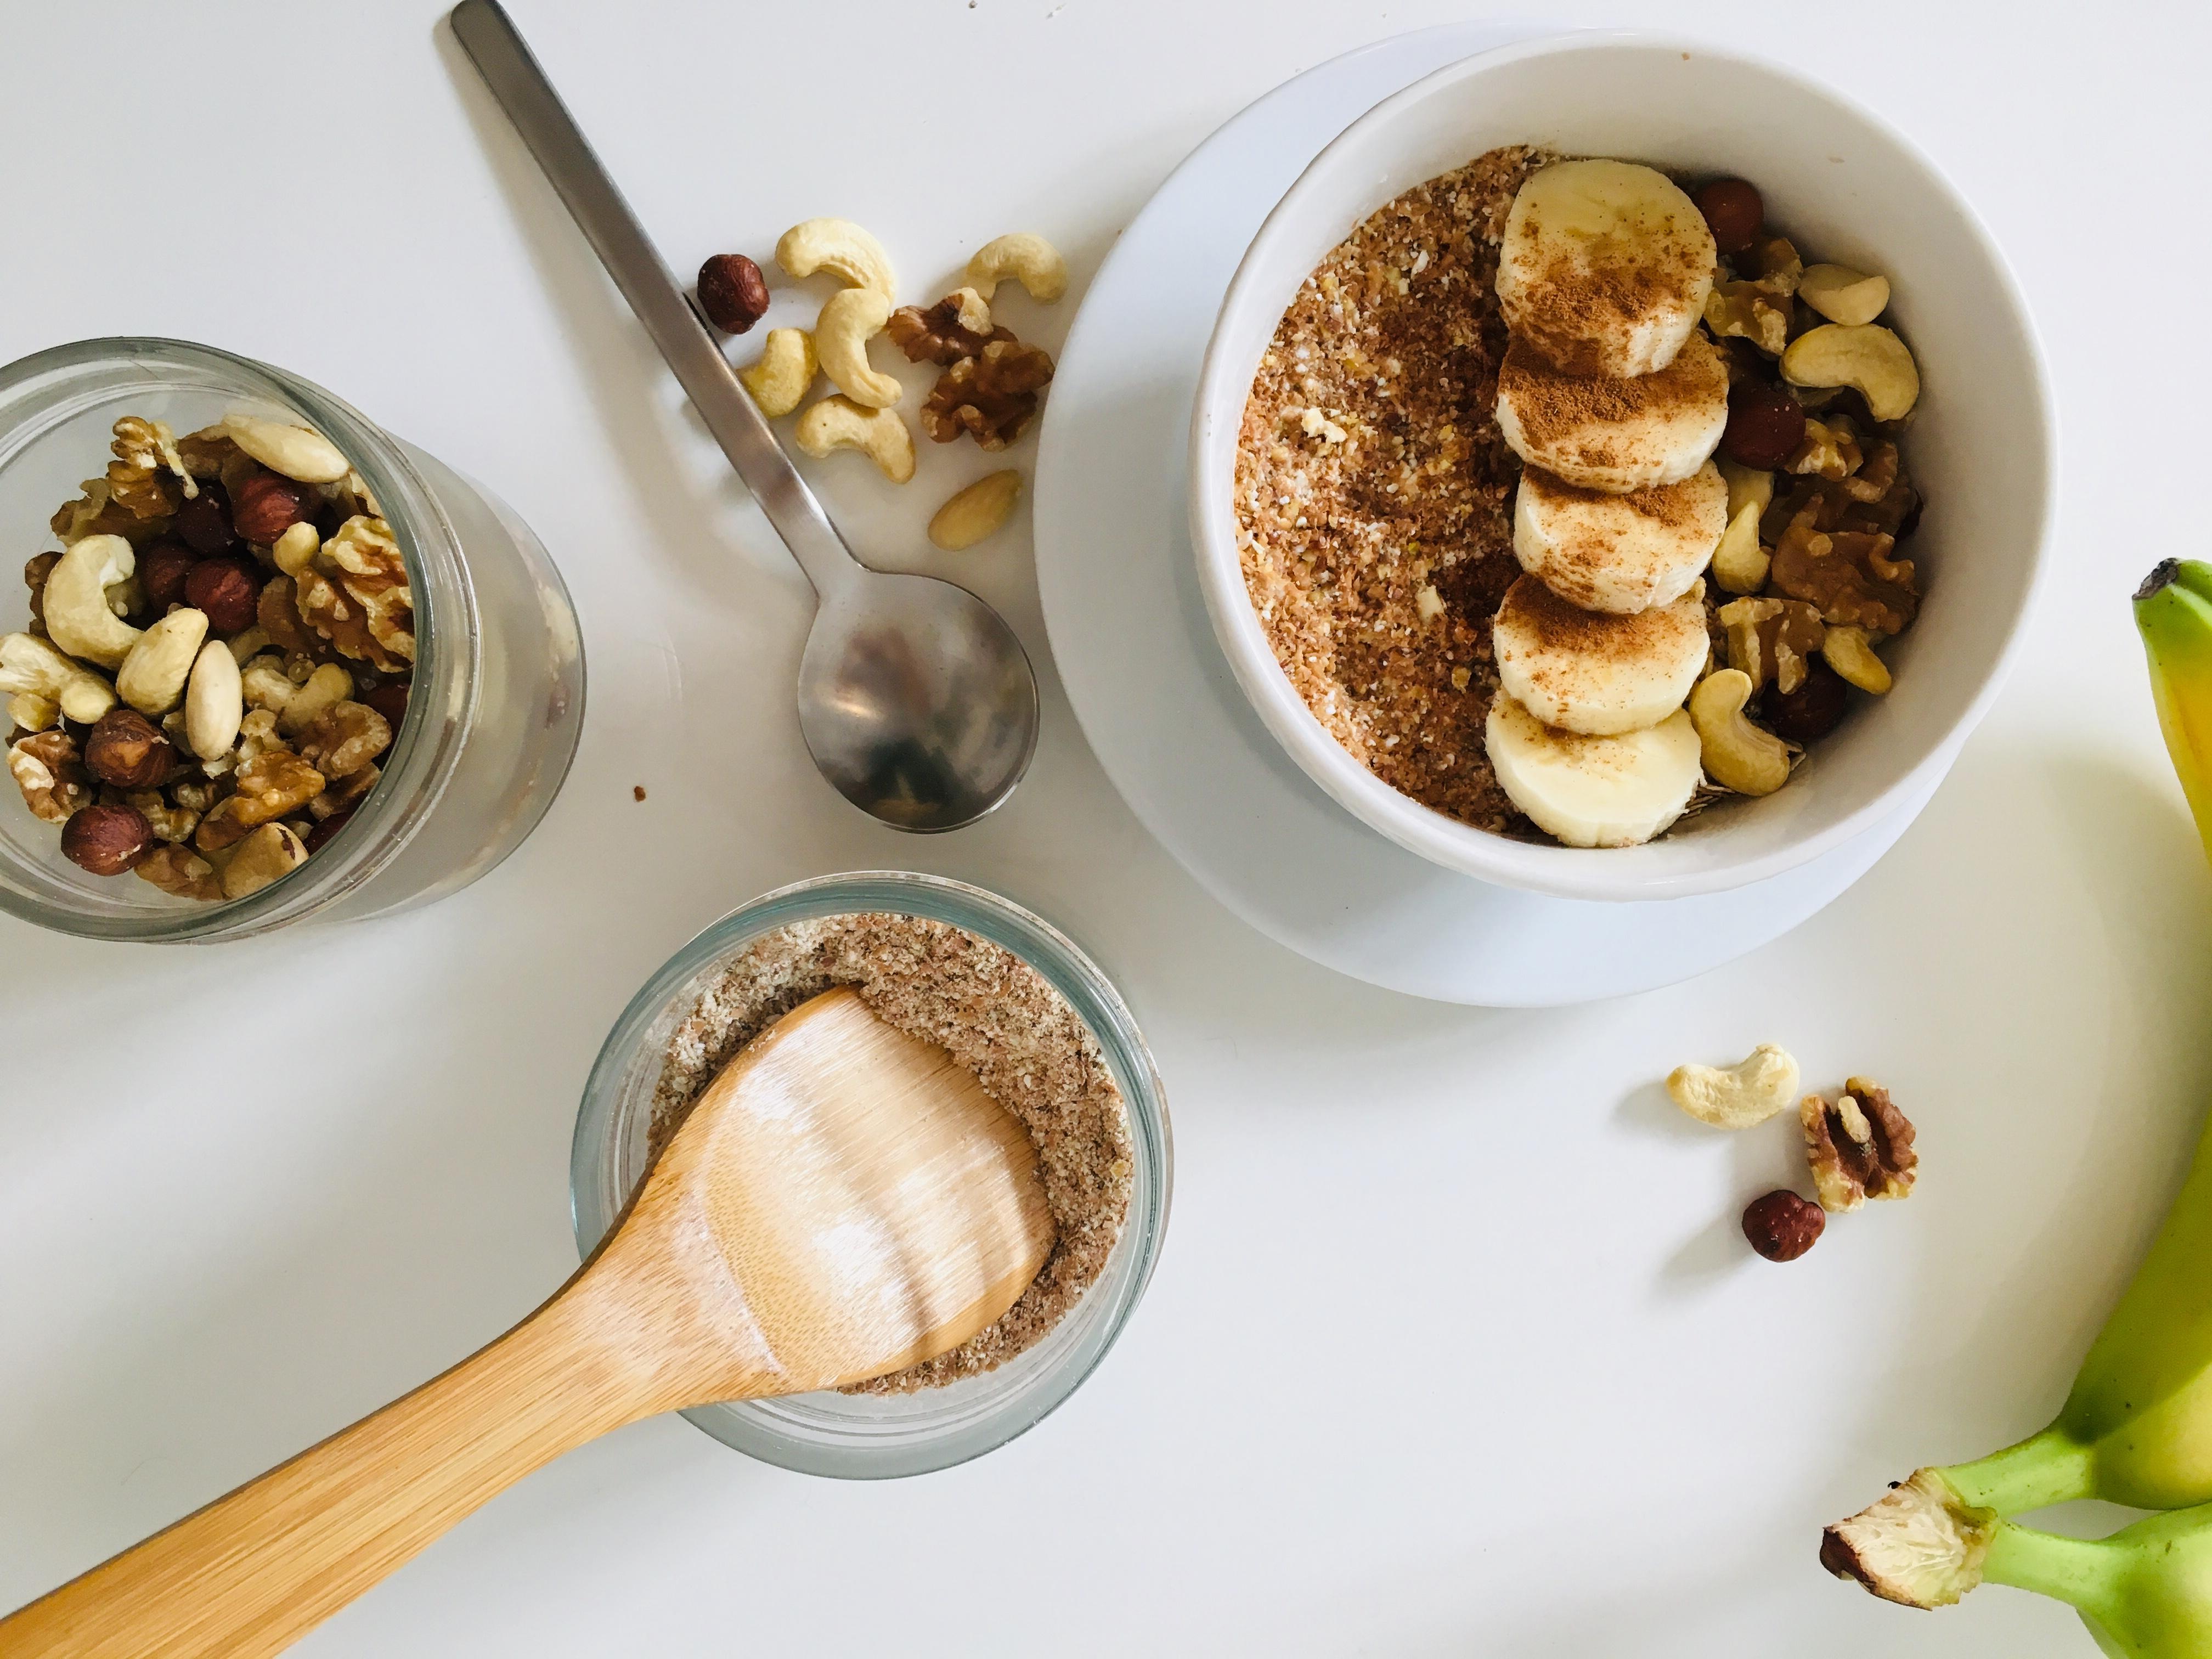 Porridge Grundrezept mit Banane und Zimt: Das fertige Porridge